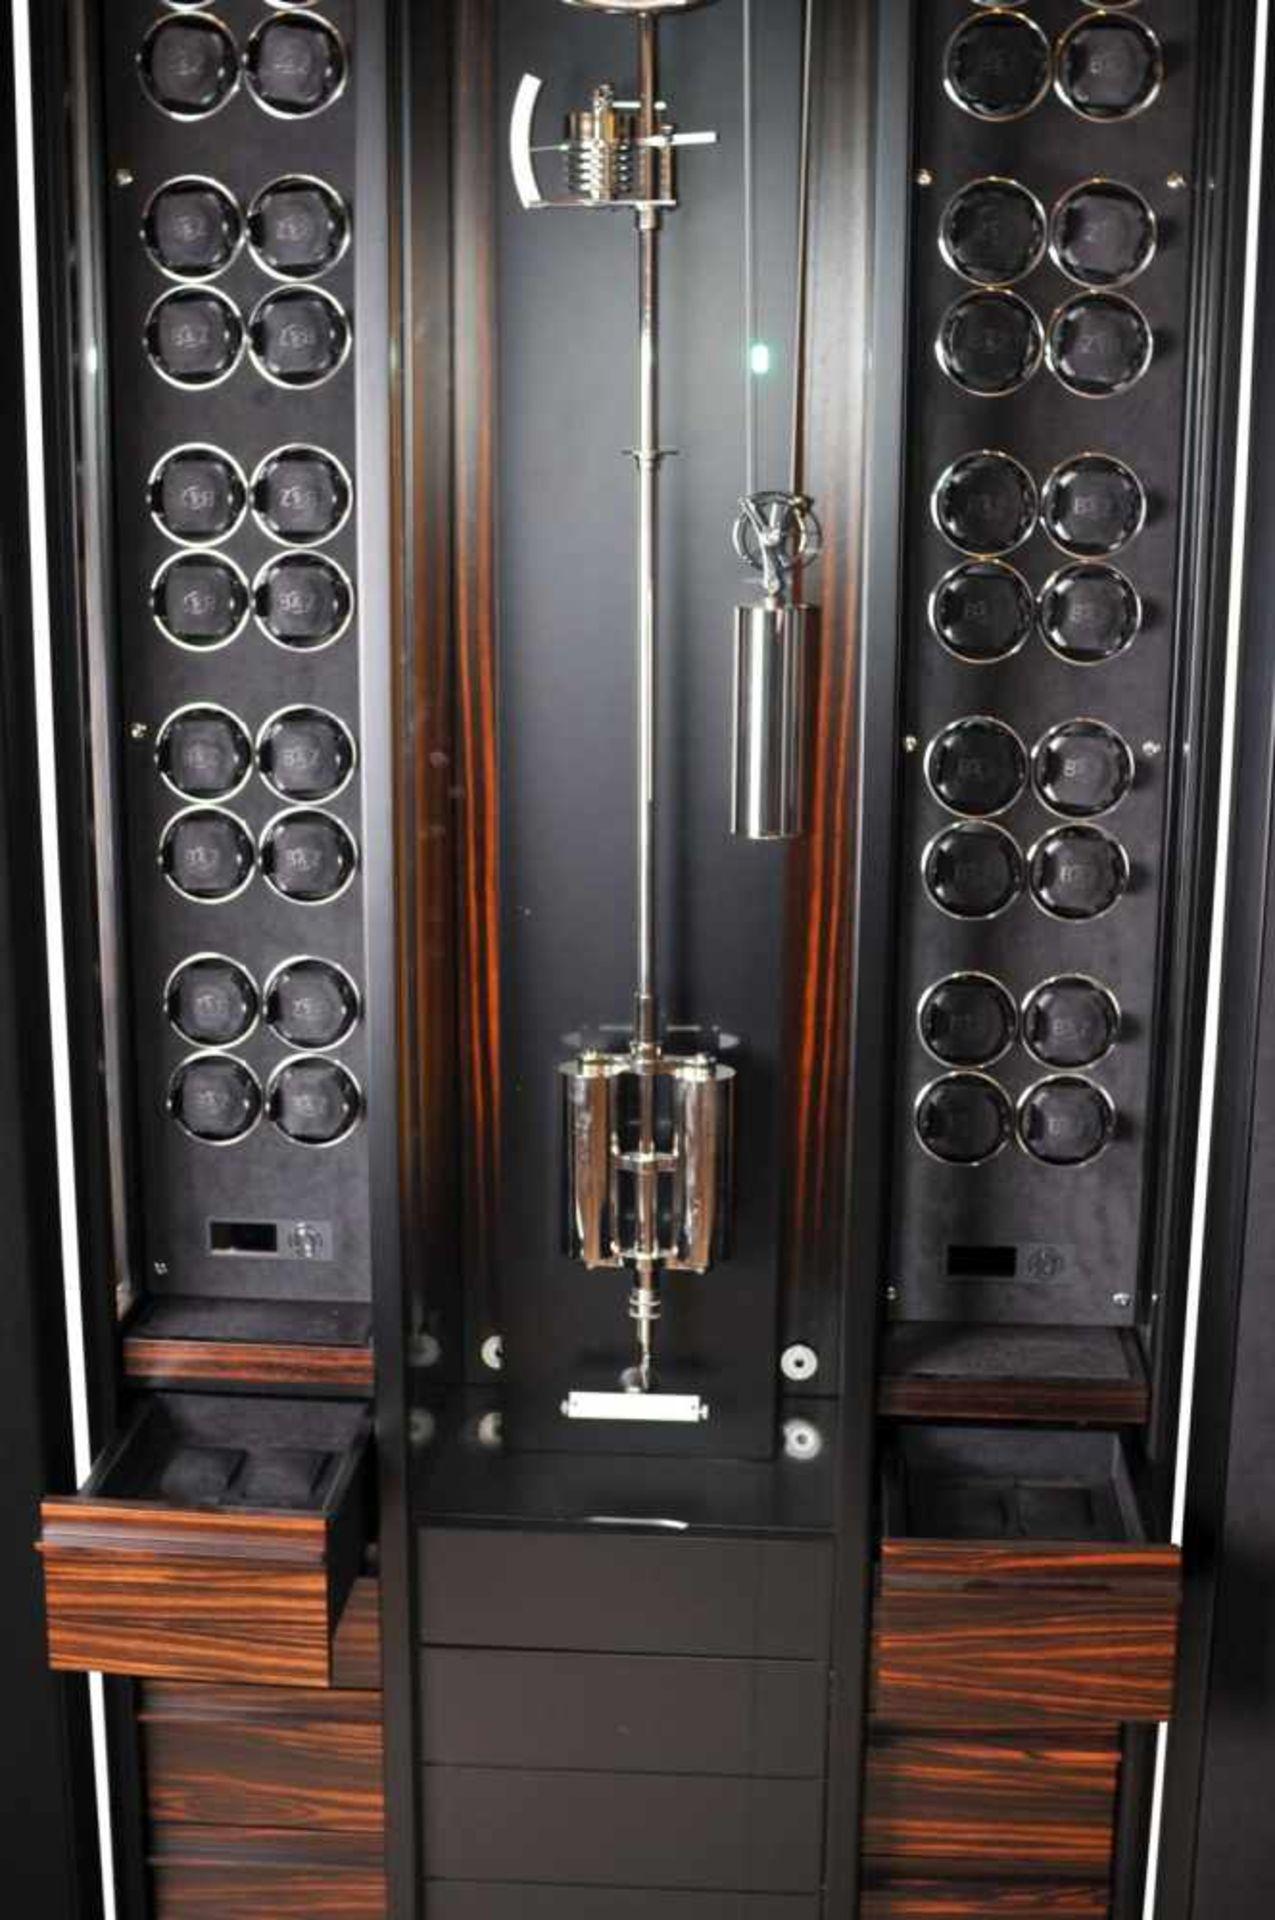 Los 56 - Time Mover Buben & Zörweg Grande Precision48 watch winders, handmade case in black silk matt with